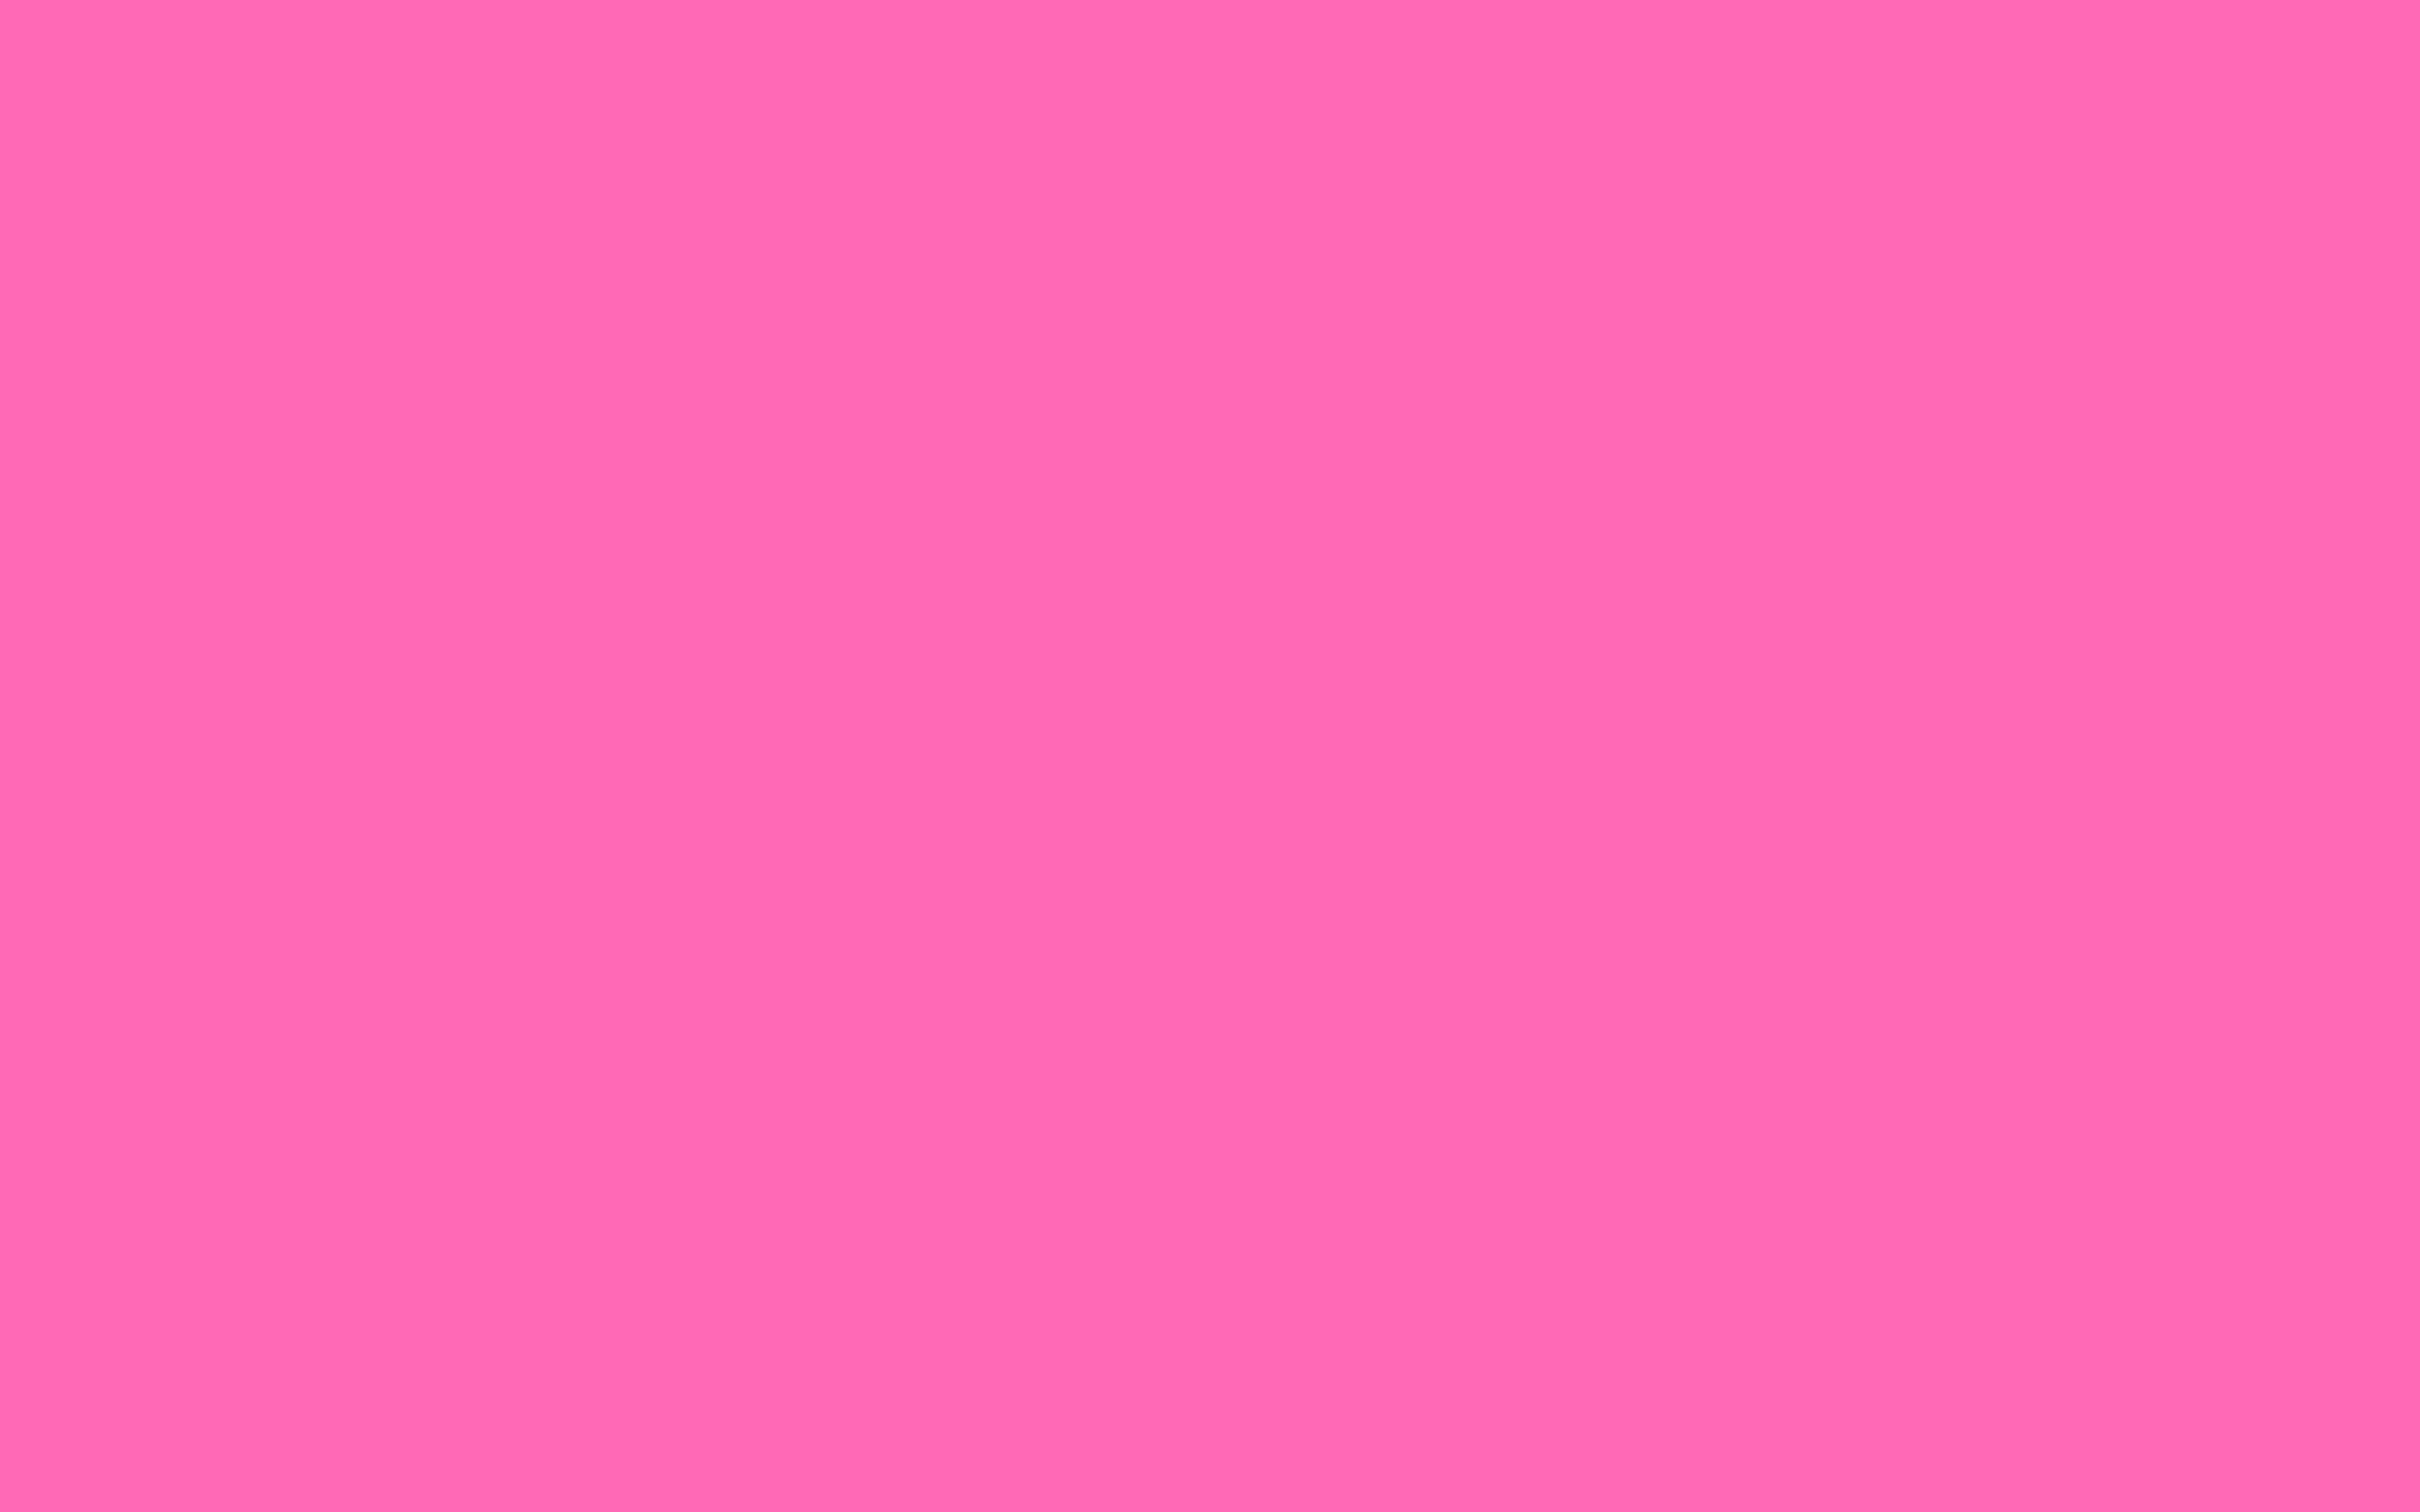 plain pink background Filofax divider one | wallpapers ... |Plain Pink Backgrounds